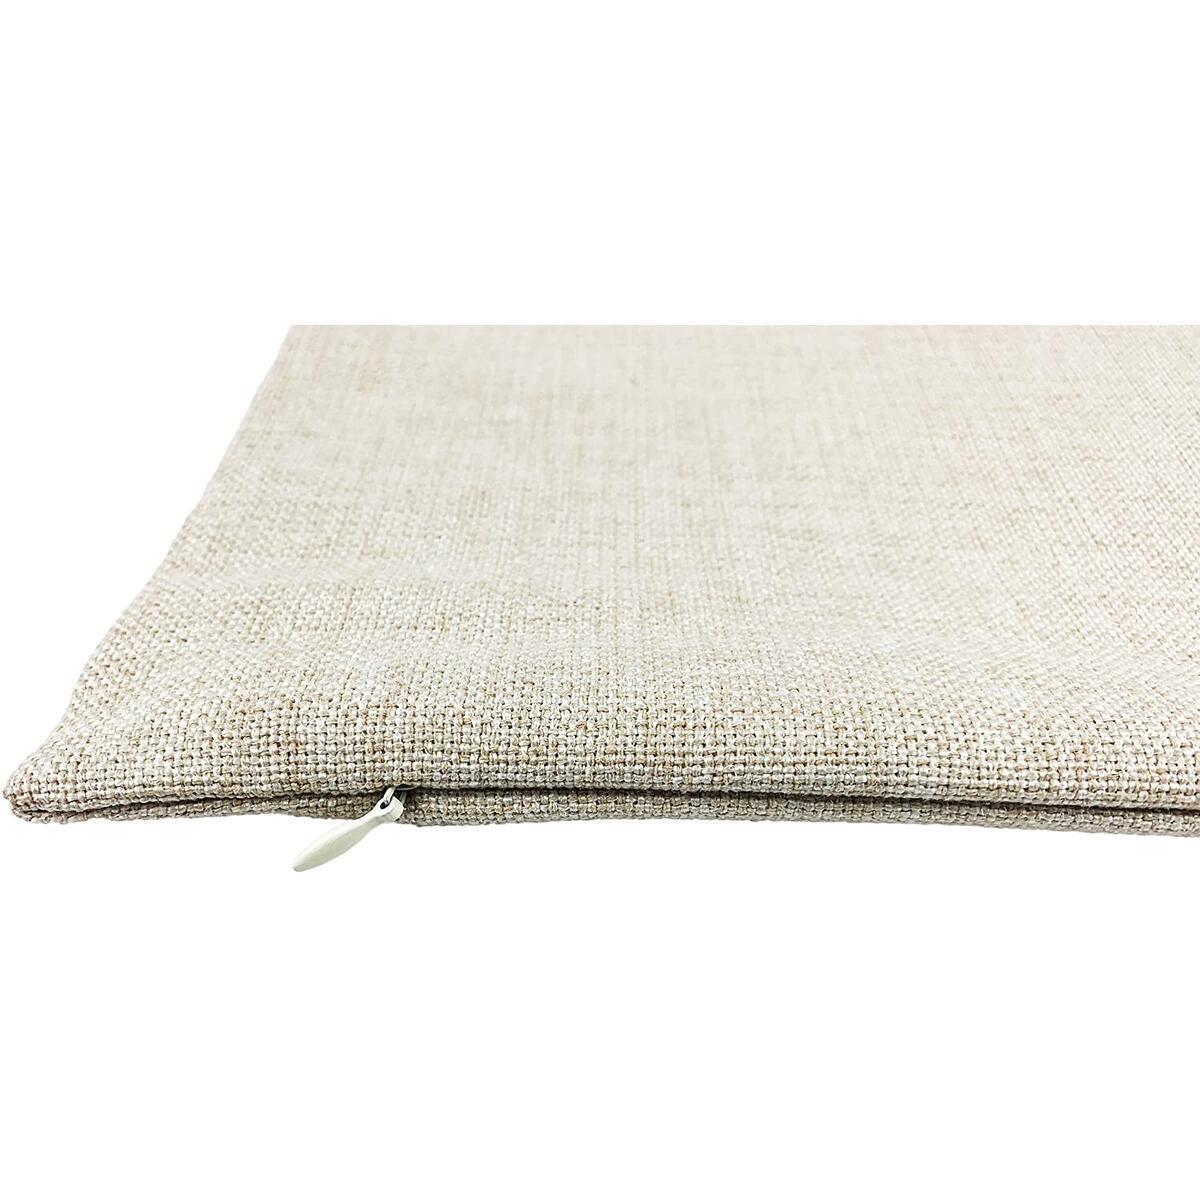 DrupsCo 18x18 Whale Pillow Cover for Couches - Whale Decor Pillow Cover, Cotton Linen Coastal Decor Beach Theme Pillow Covers